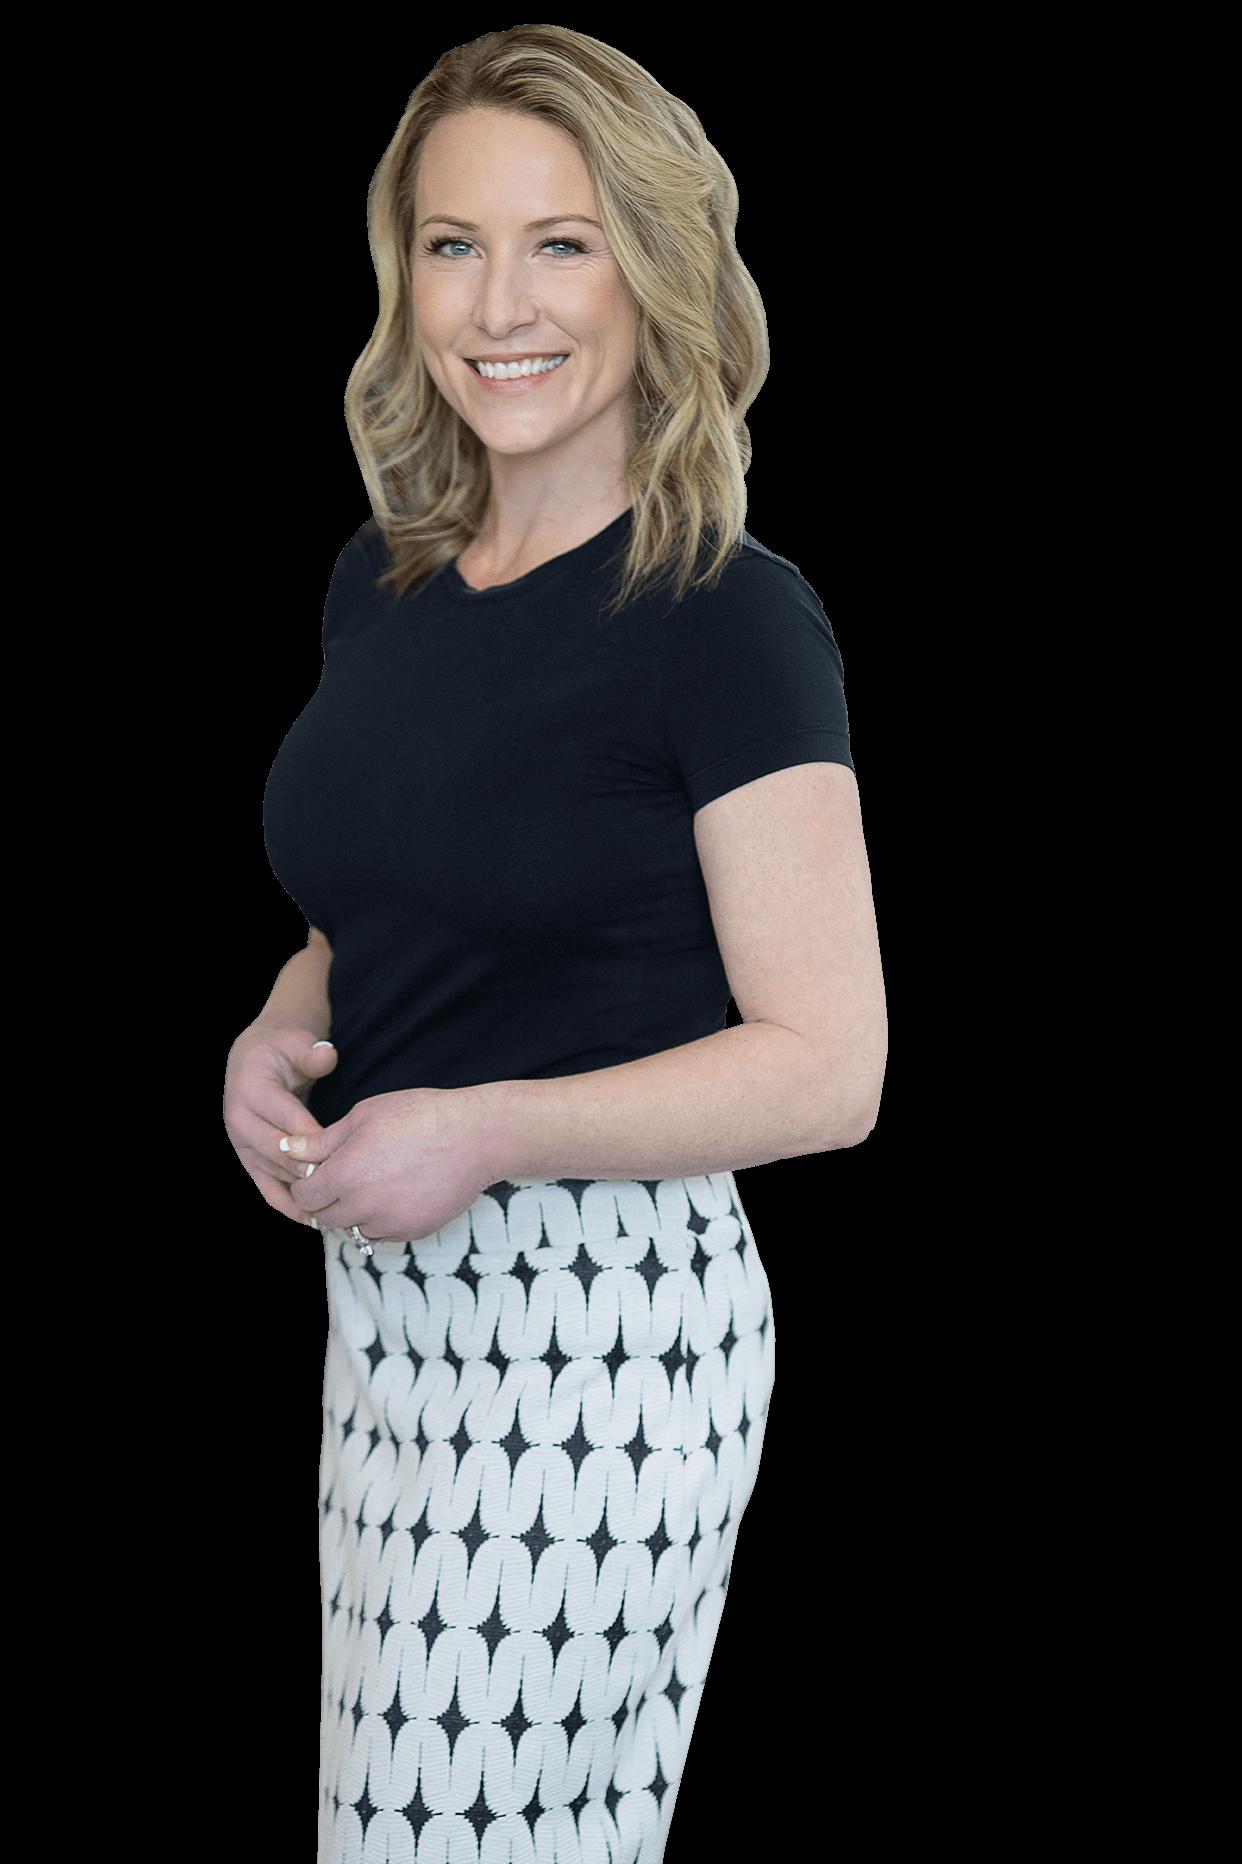 Katie Wright - Associate Broker - The Wright Team Realtors